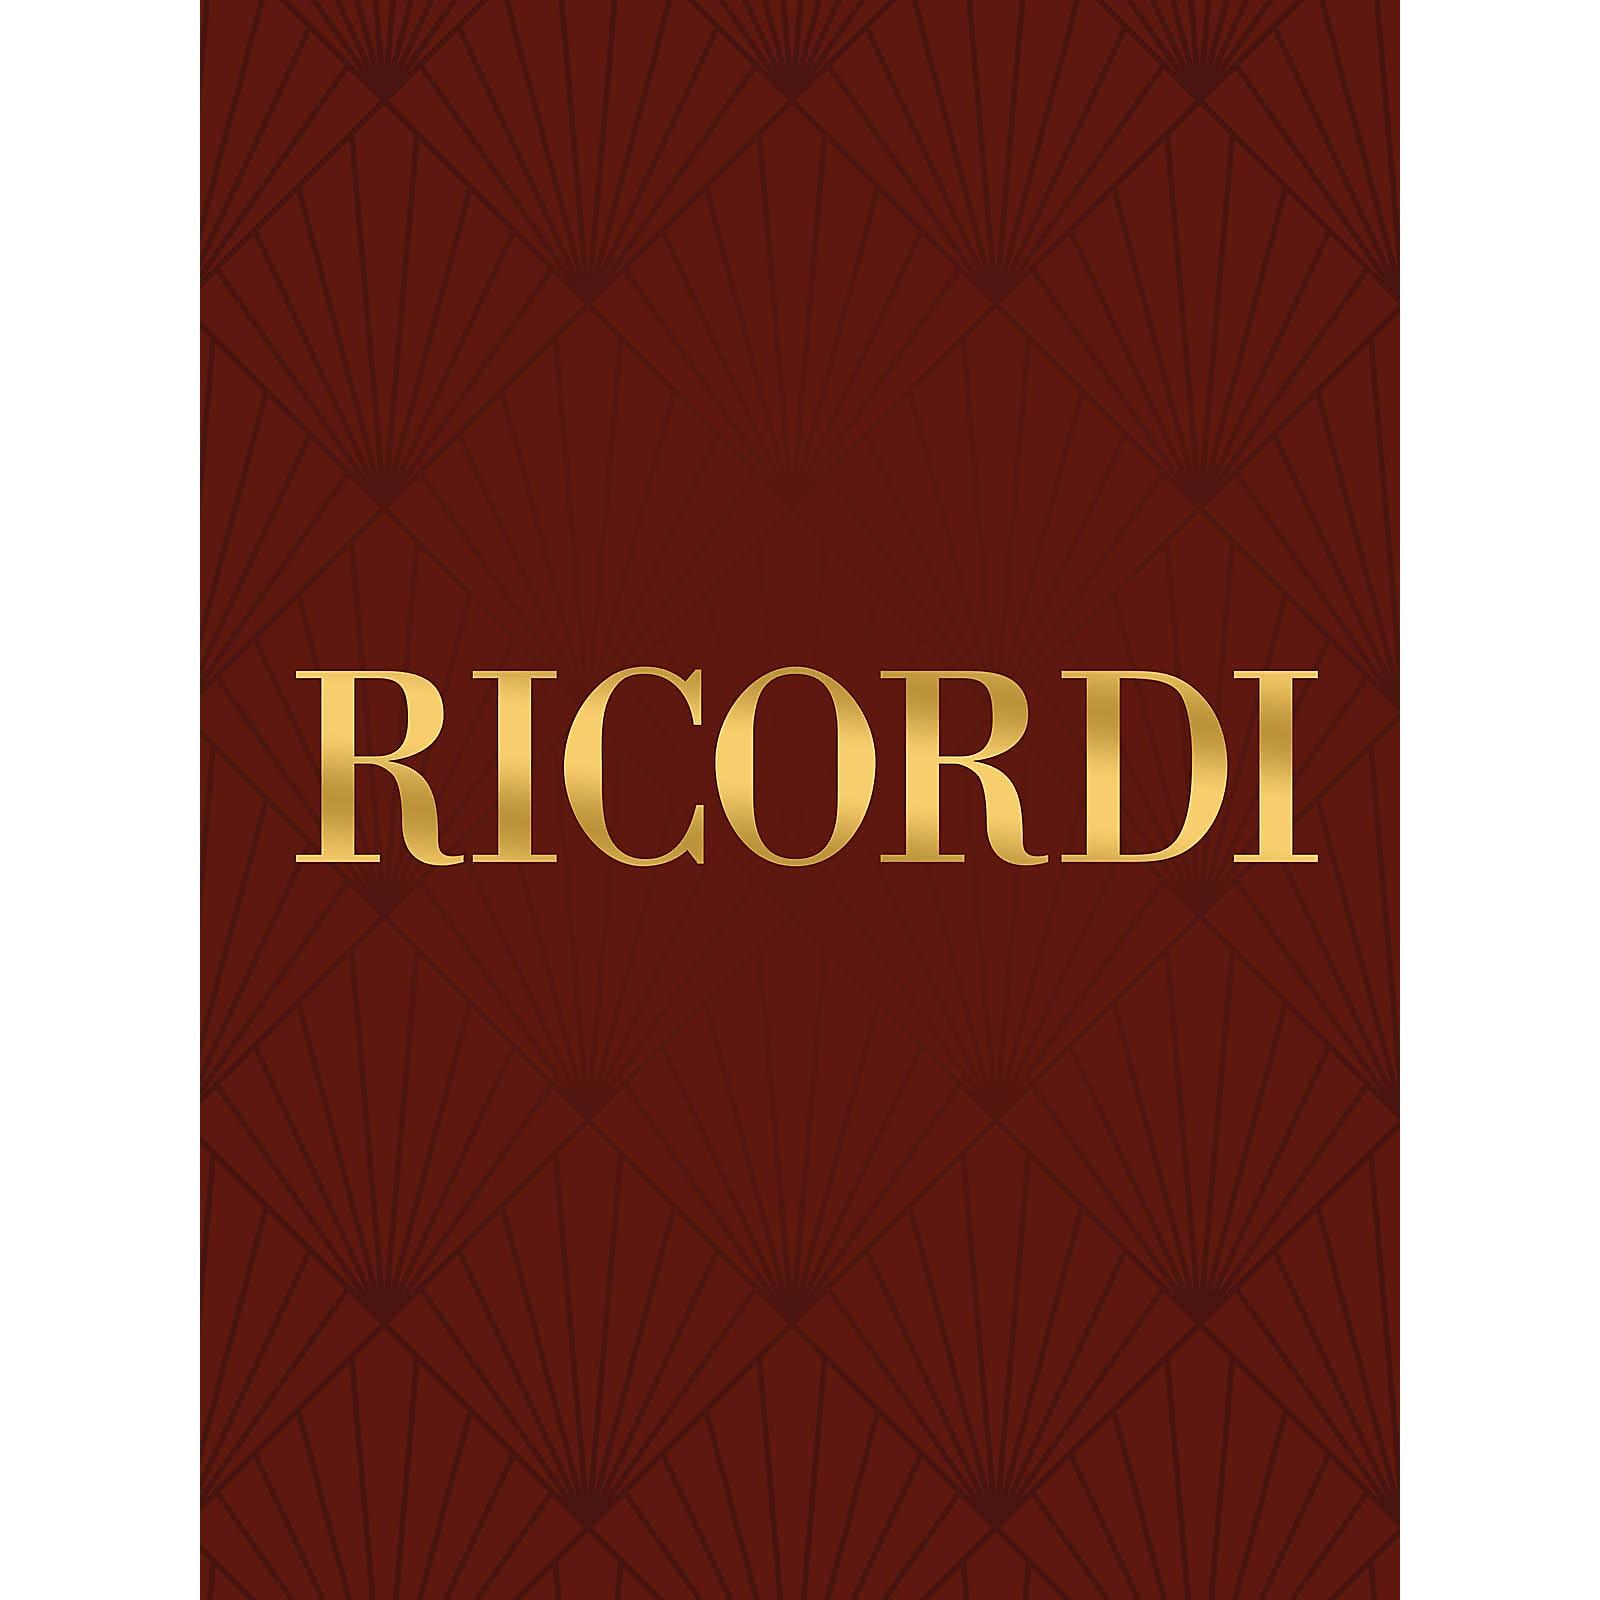 Ricordi 26 Exercises, Op. 107, Book 1 Woodwind Method Series by Anton Fürstenau Edited by Fabbrician